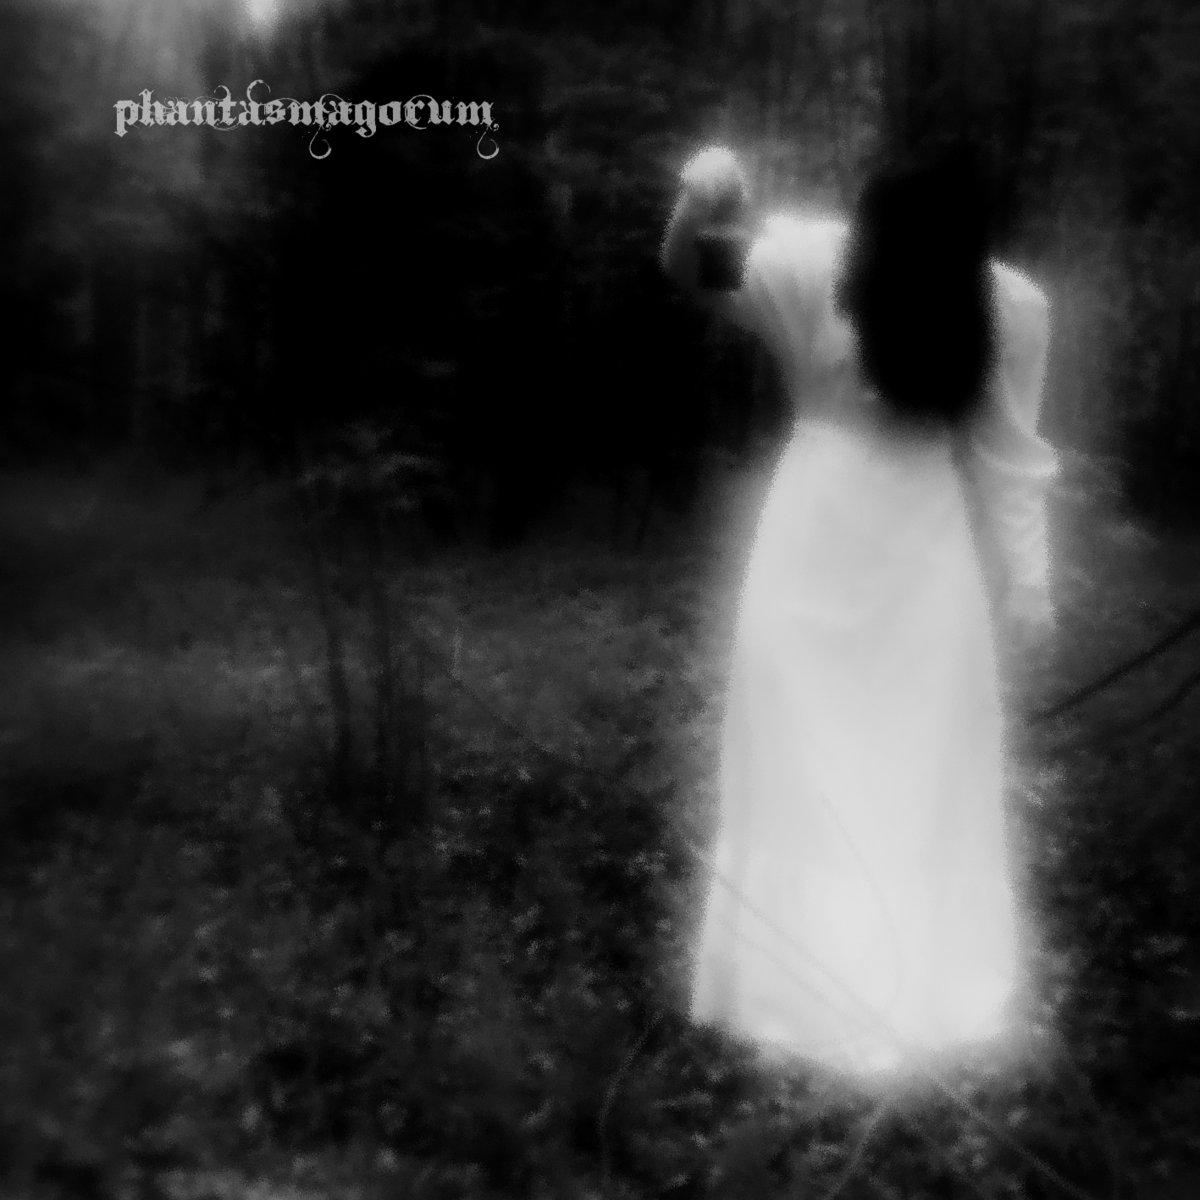 https://phantasmagorum.bandcamp.com/releases